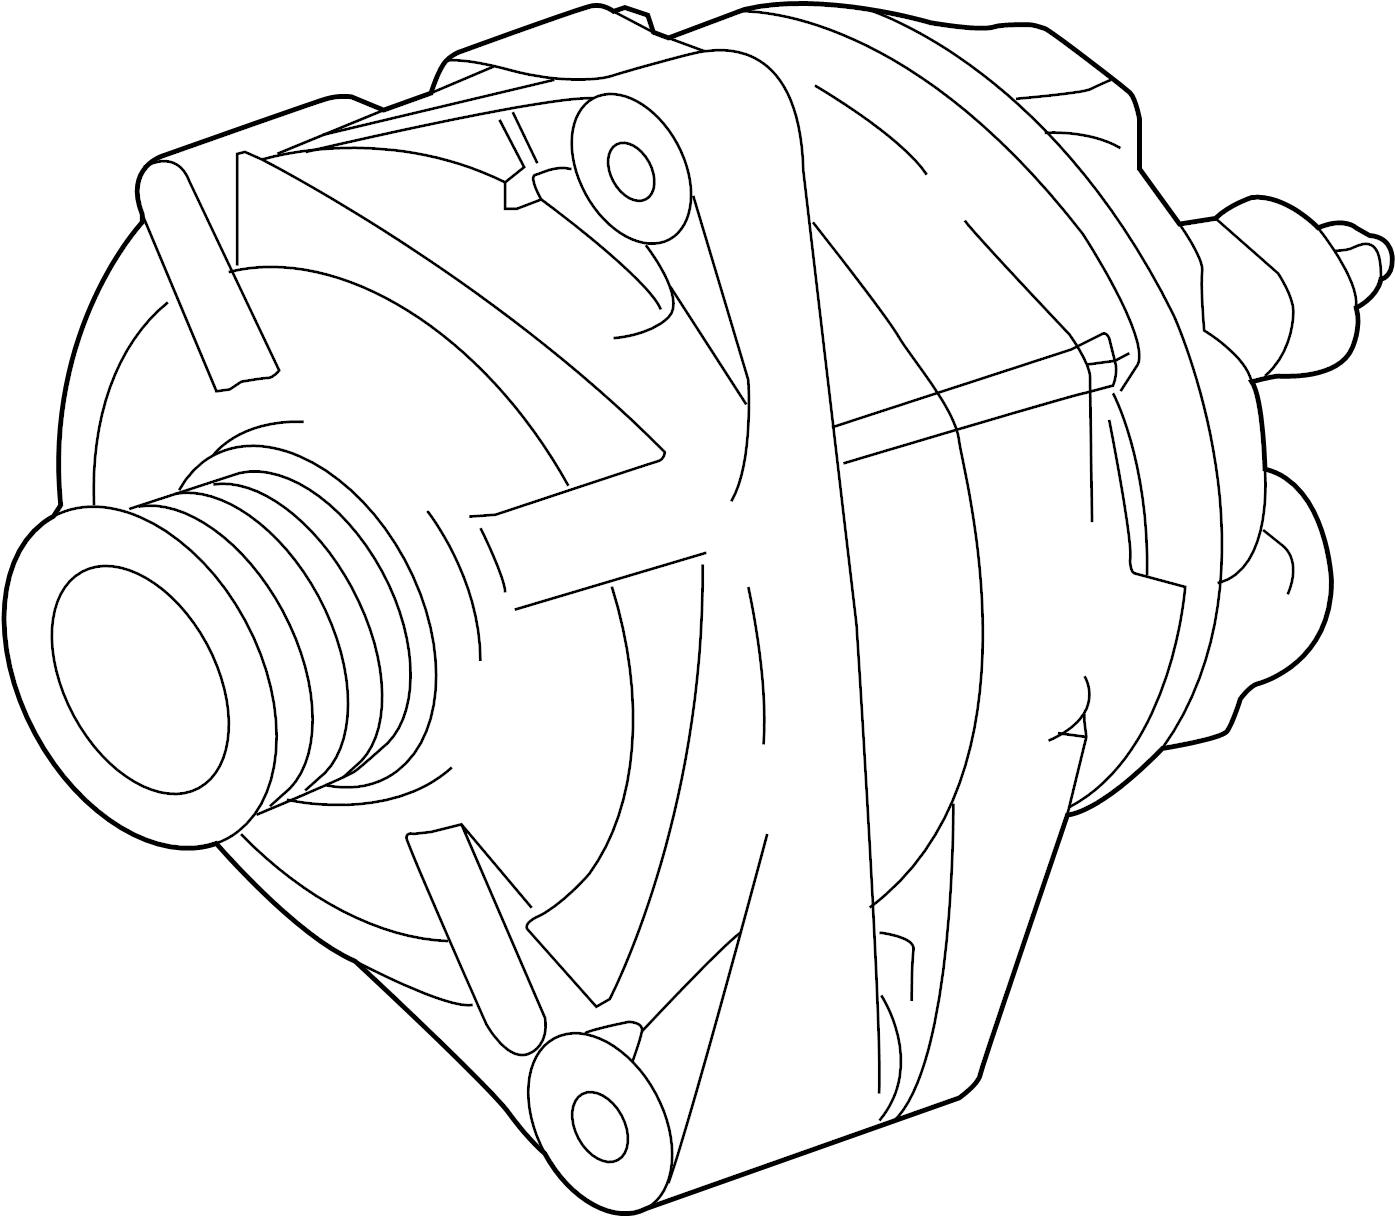 jaguar xkr-s alternator  from chassis  vin 913550  to chassis  vin k40205